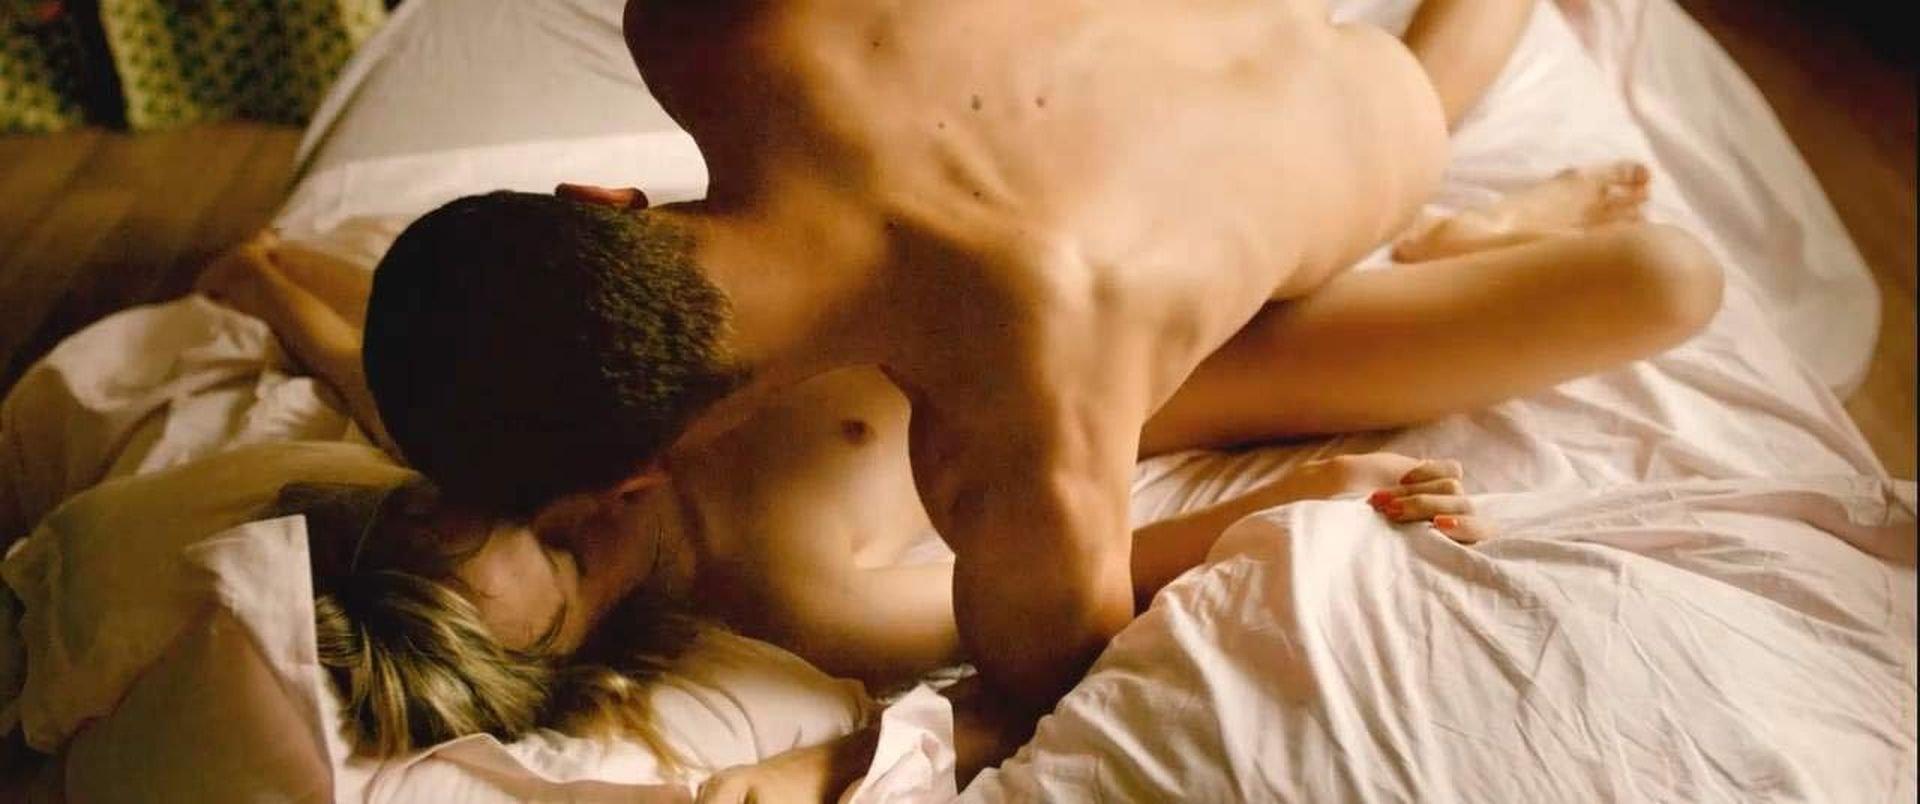 Explicit Picture Sex Scene